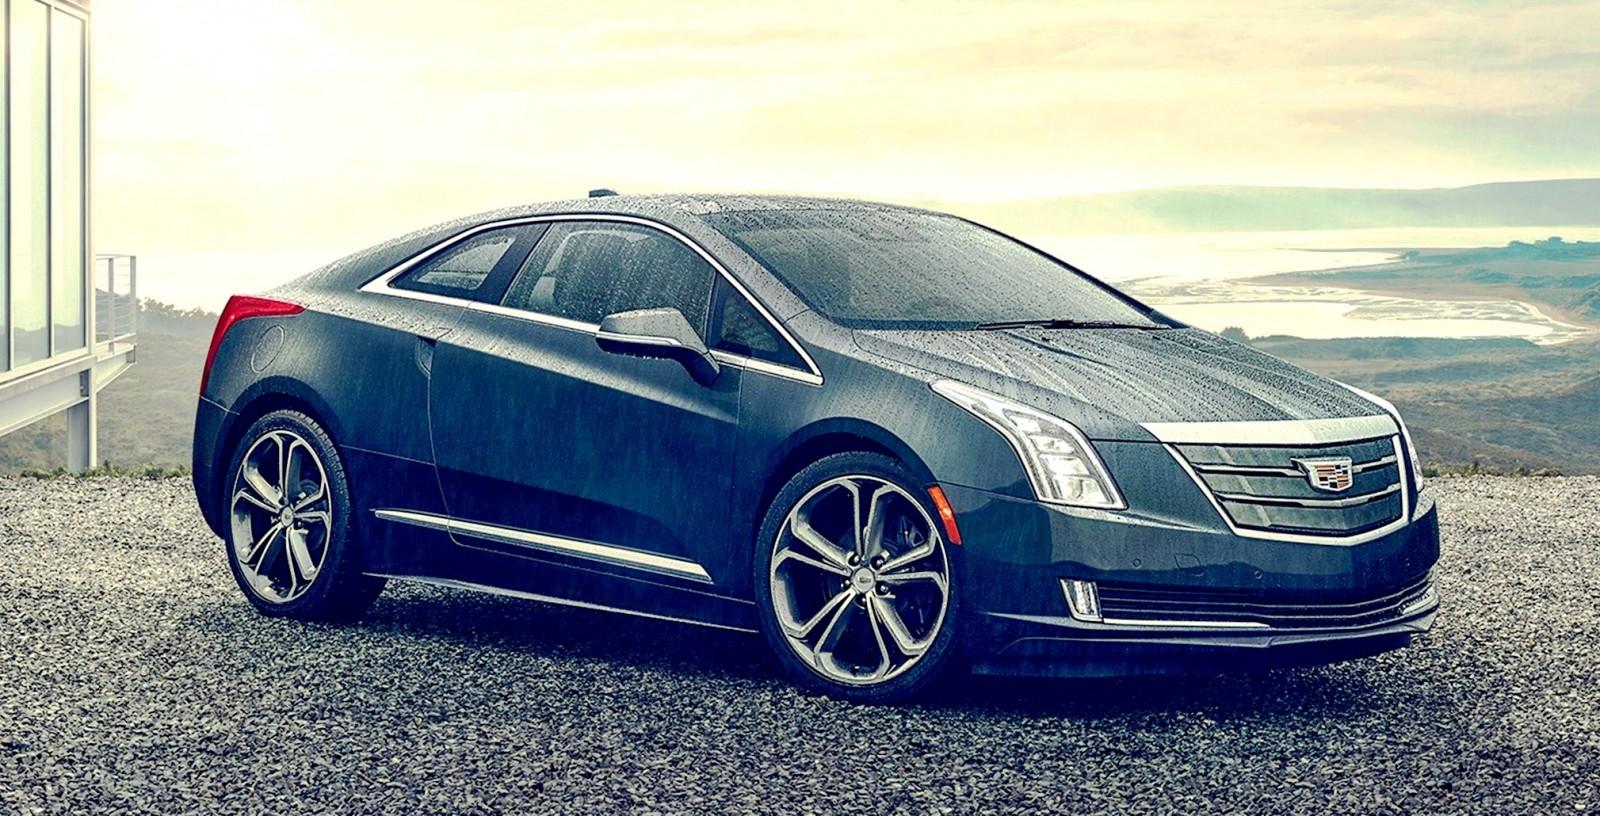 2016-Cadillac-ELR-Performance-Pack-1-1600x816.jpg